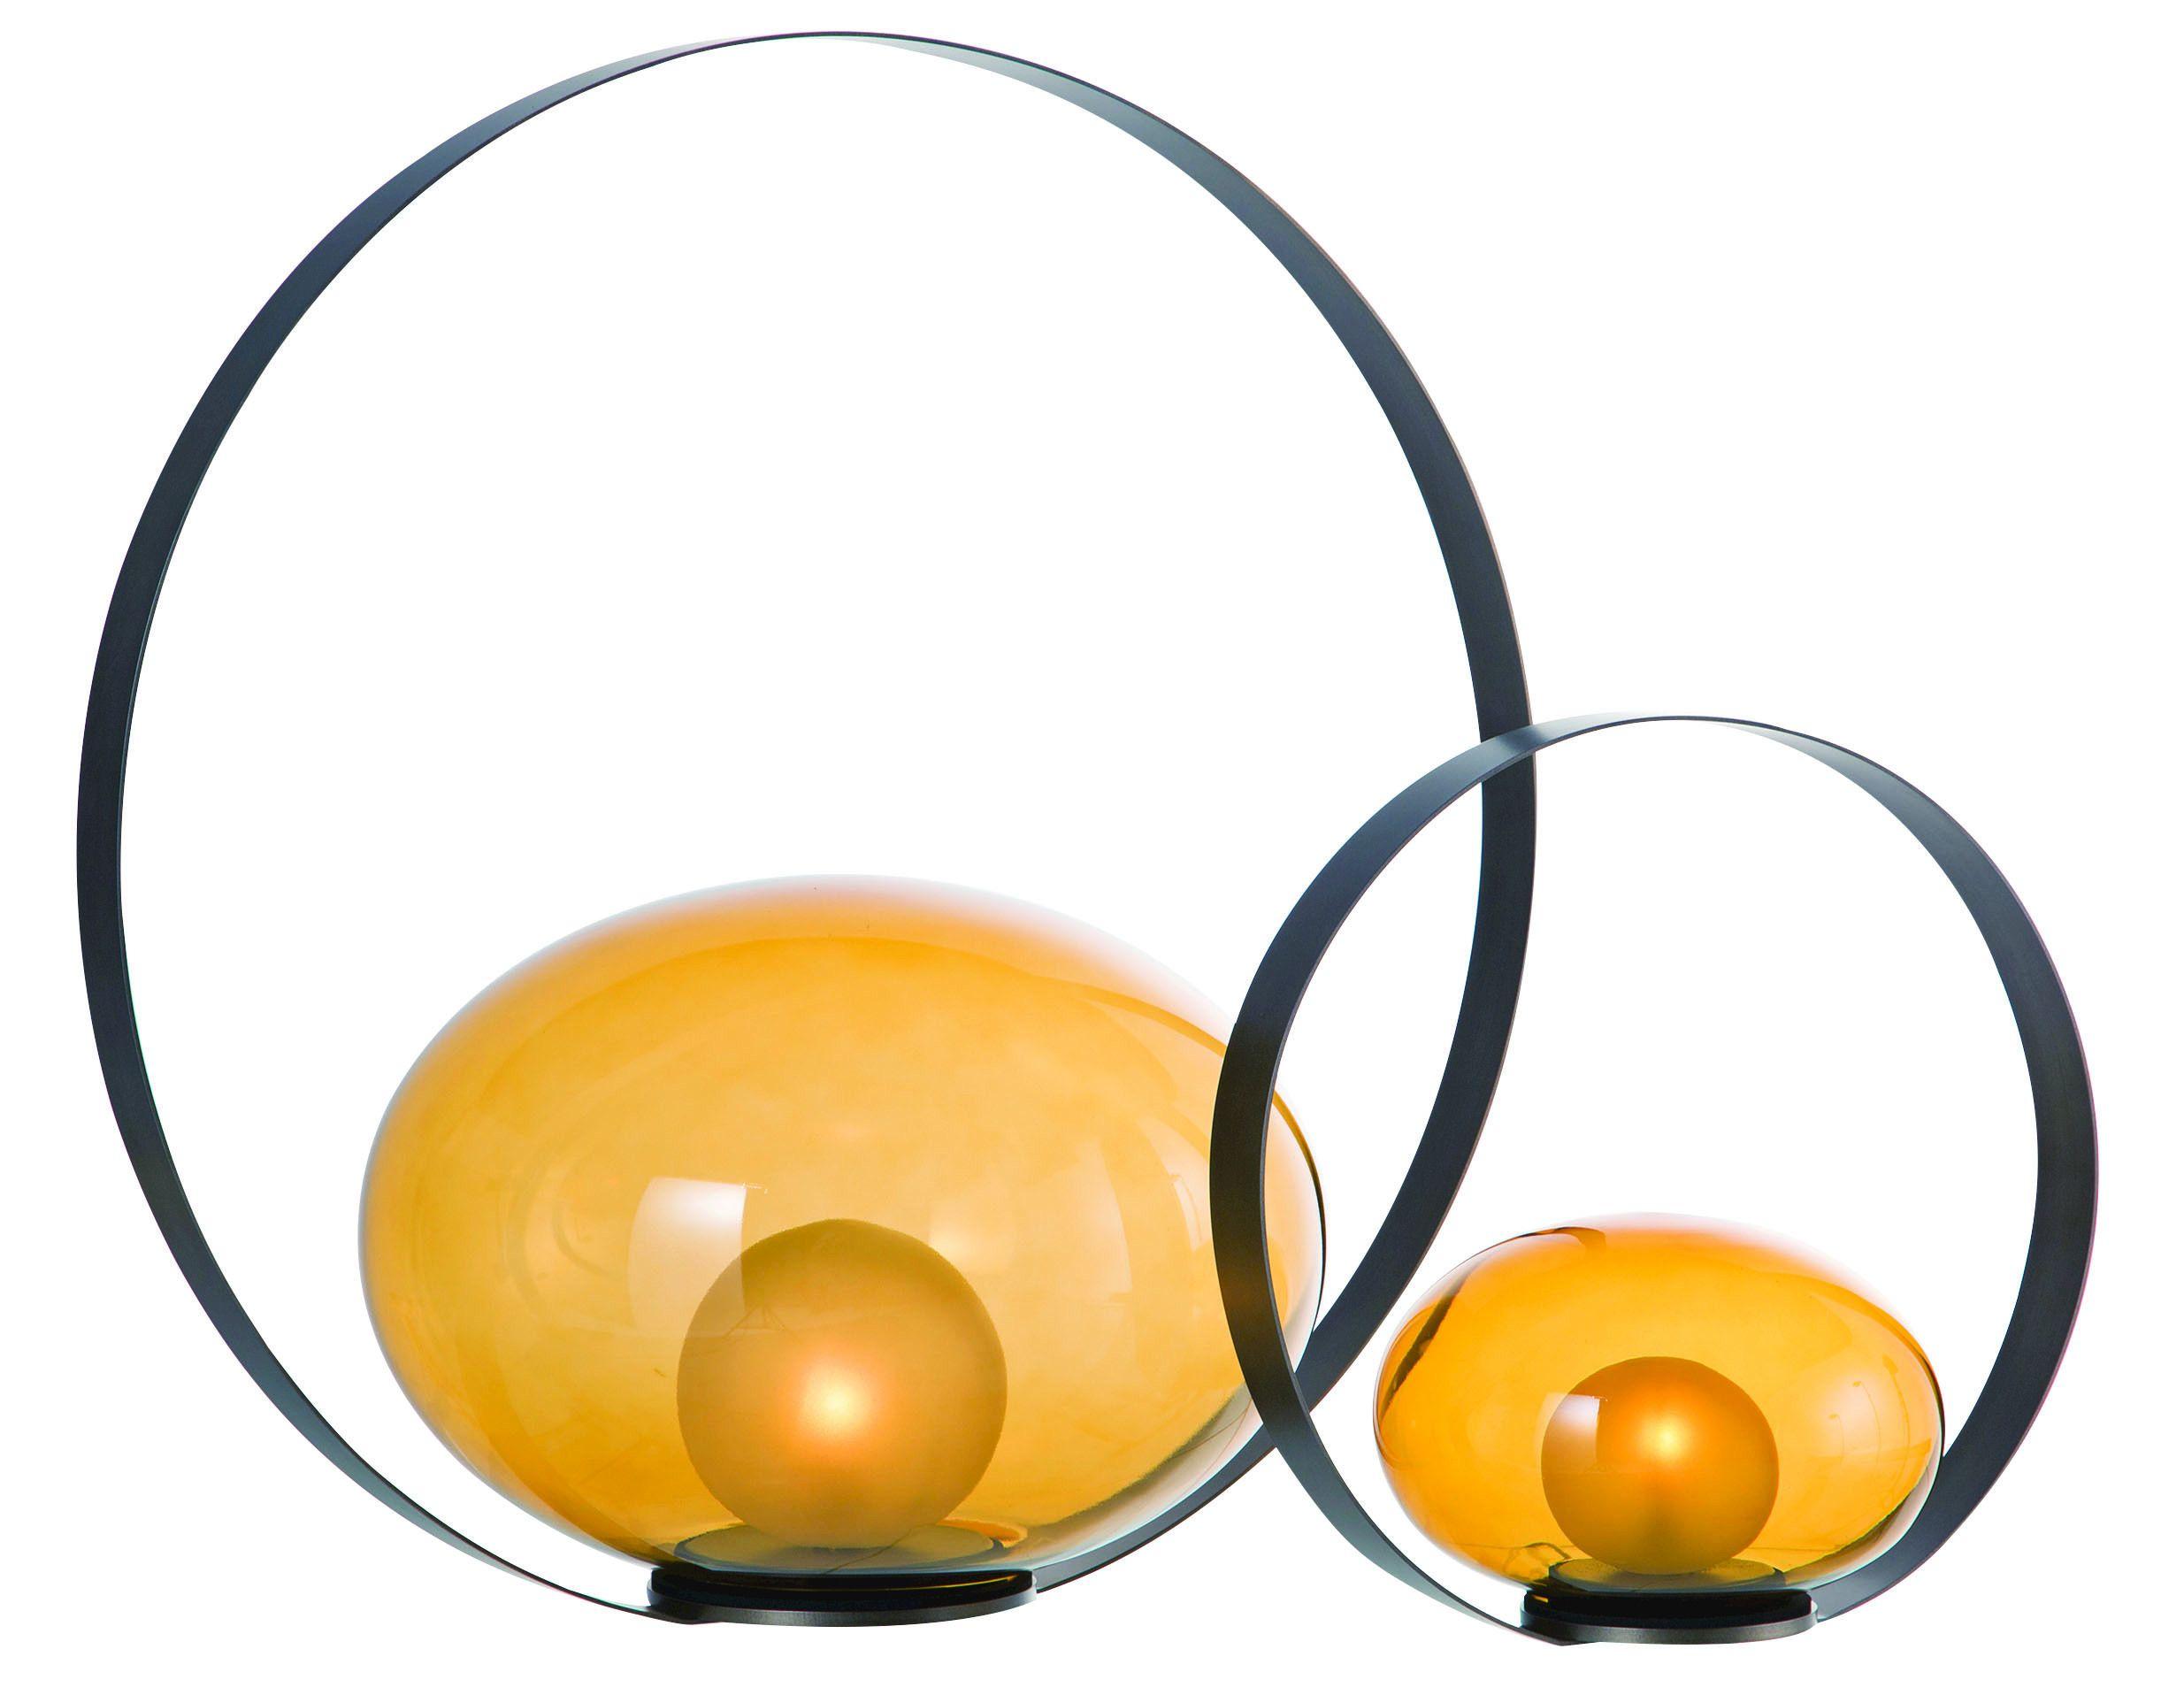 lampe de table en verre de murano voila collection accessoires by roche bobois design alessio bassan. Black Bedroom Furniture Sets. Home Design Ideas